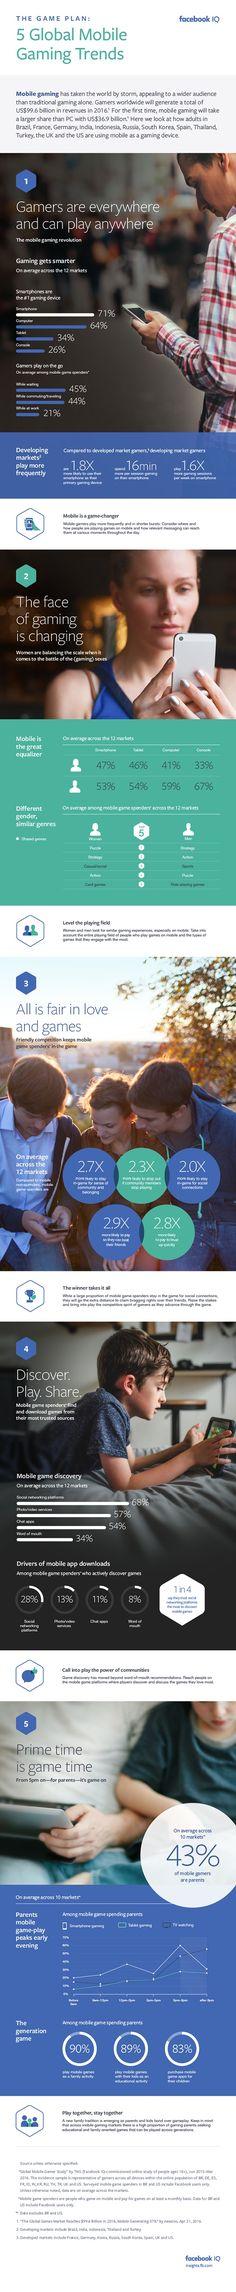 Facebook IQ Gaming Infographic